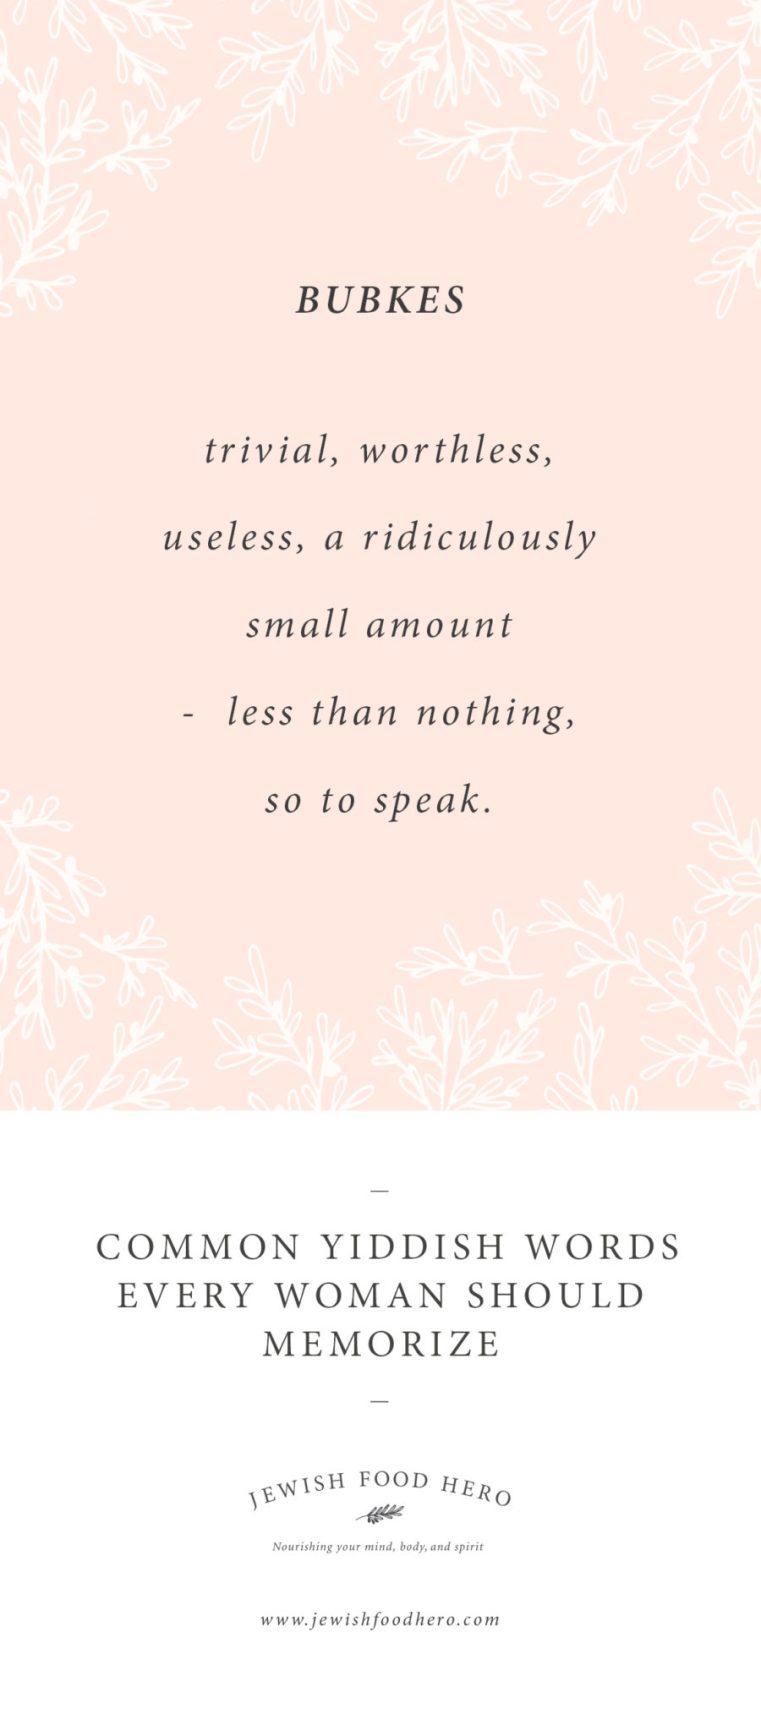 Bubkes, Yiddish phrases, Yiddish words